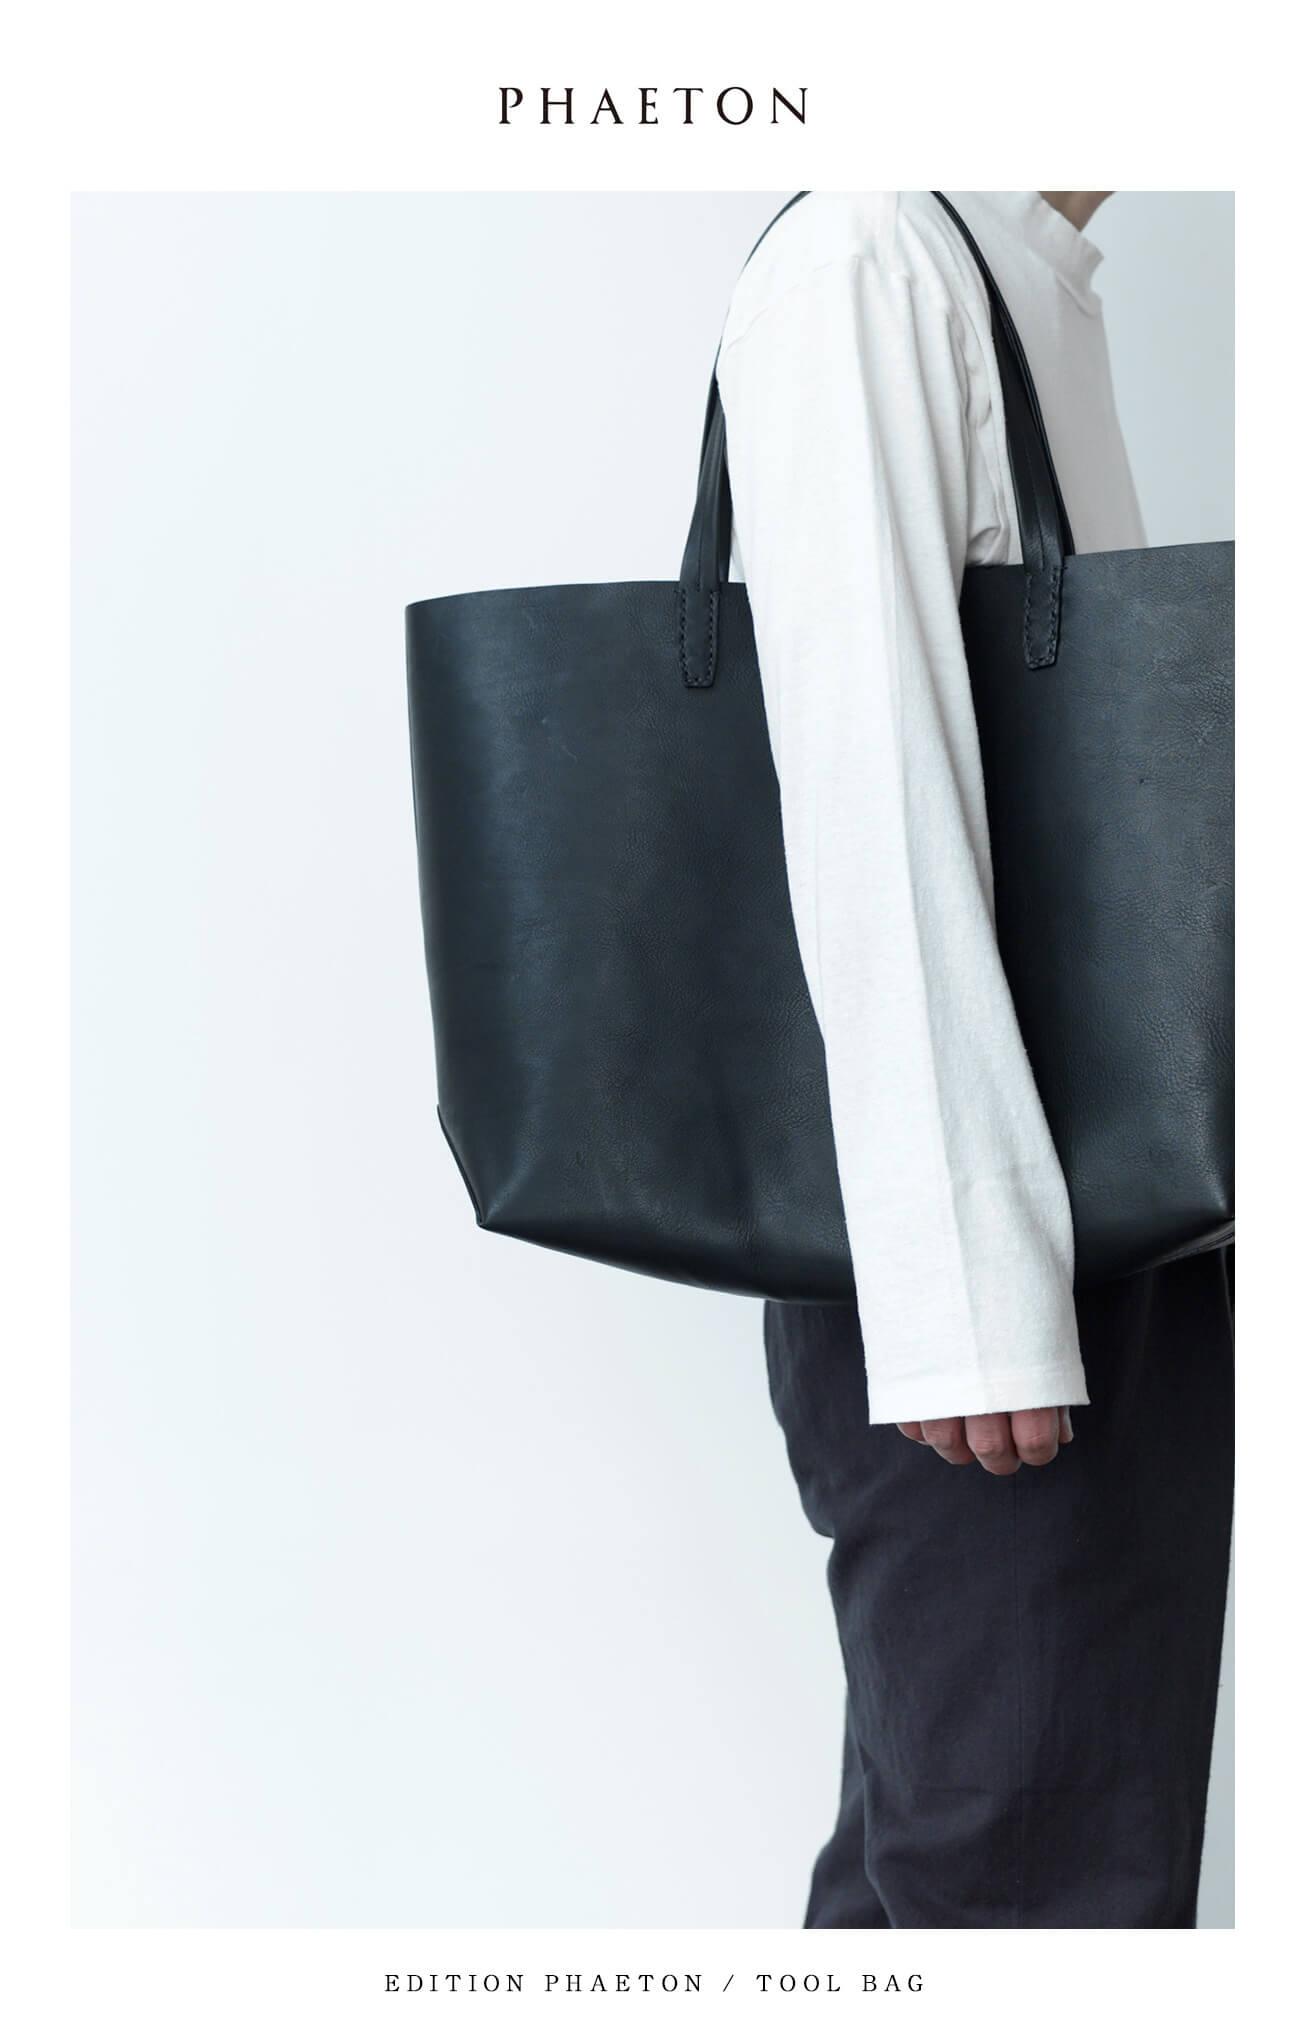 editionphaeton-toolbag03